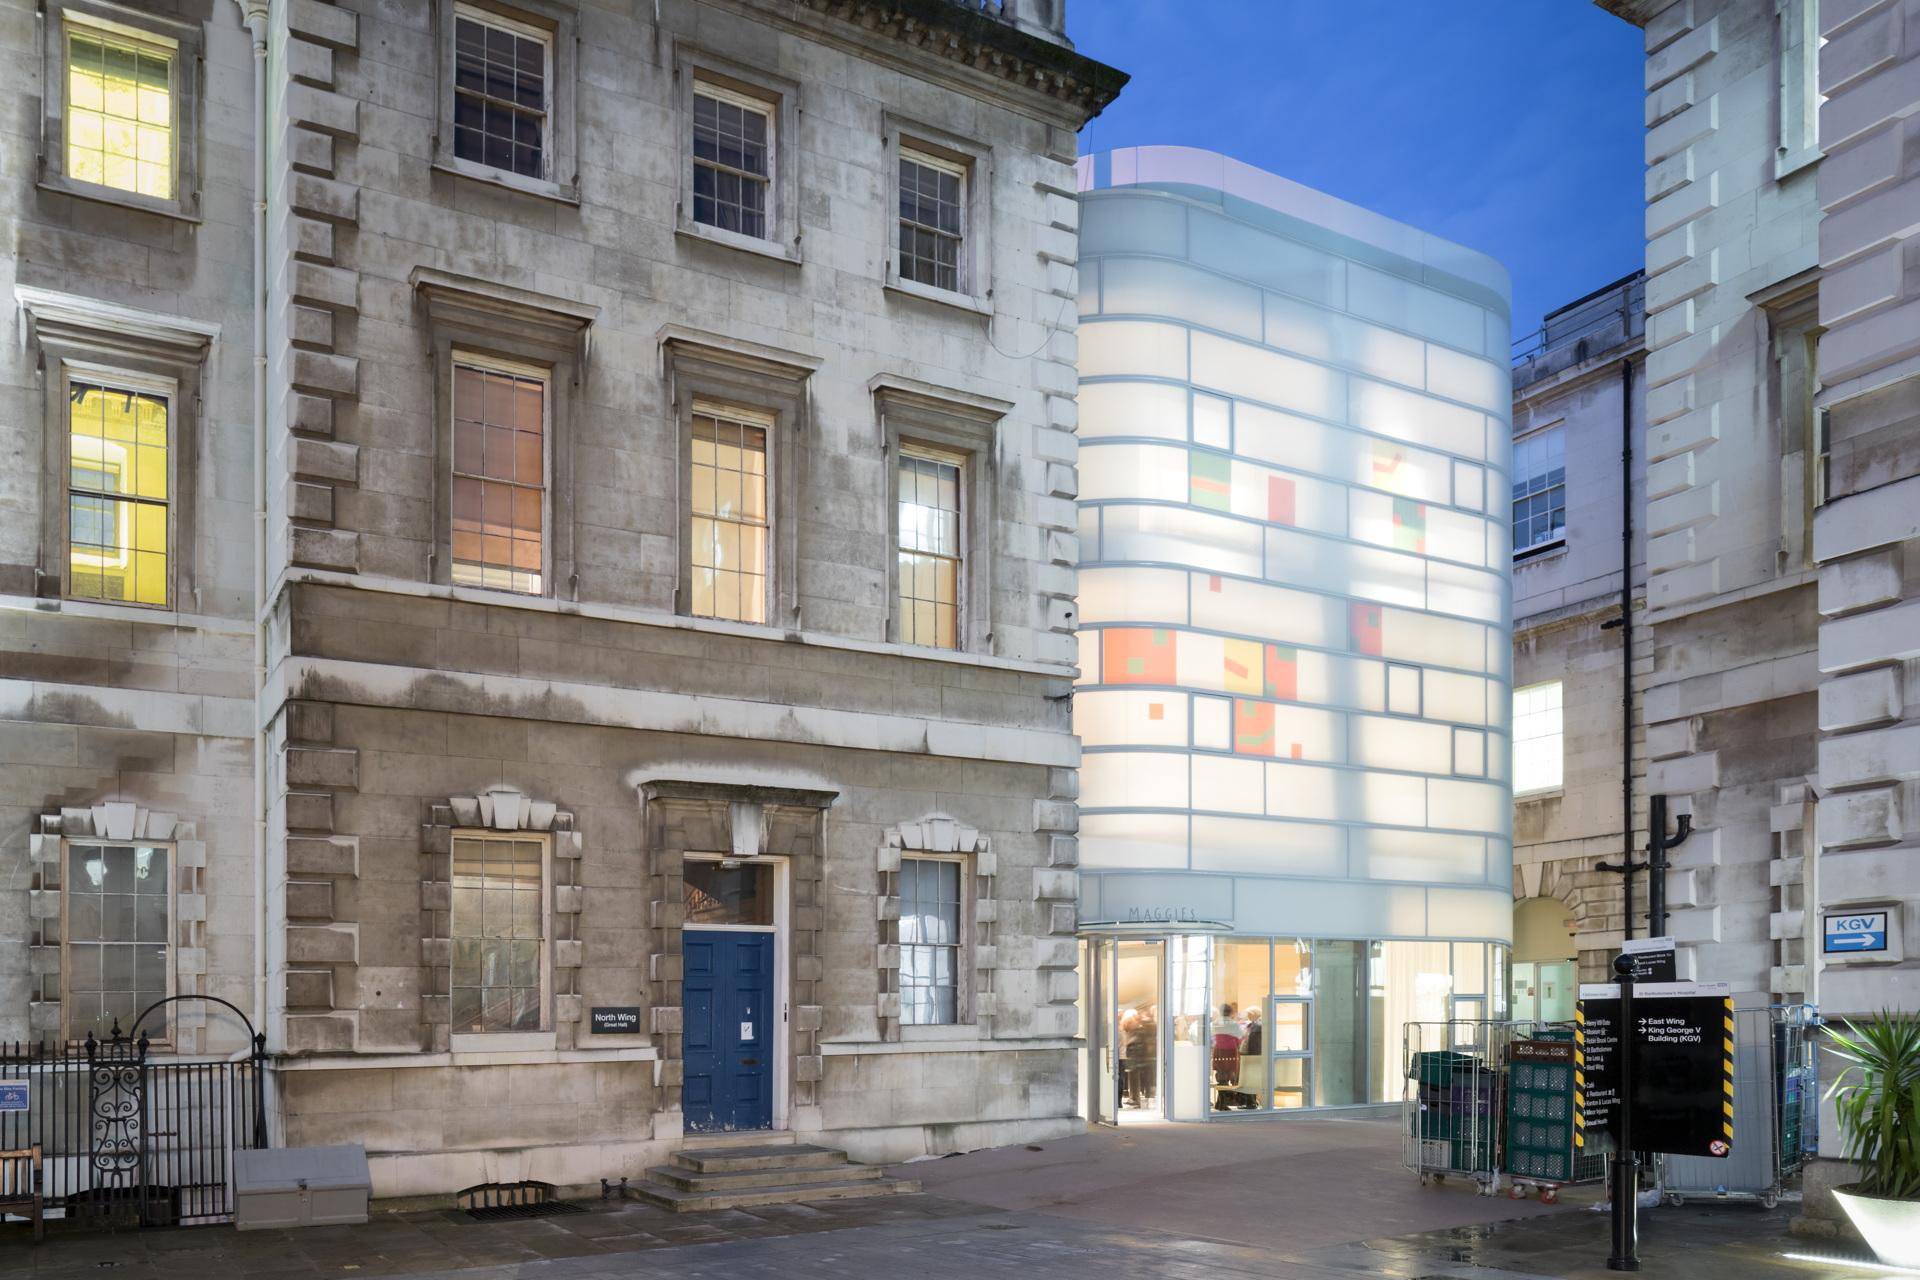 Steven Holl + jmarchitects: Maggie's Centre Barts Londra